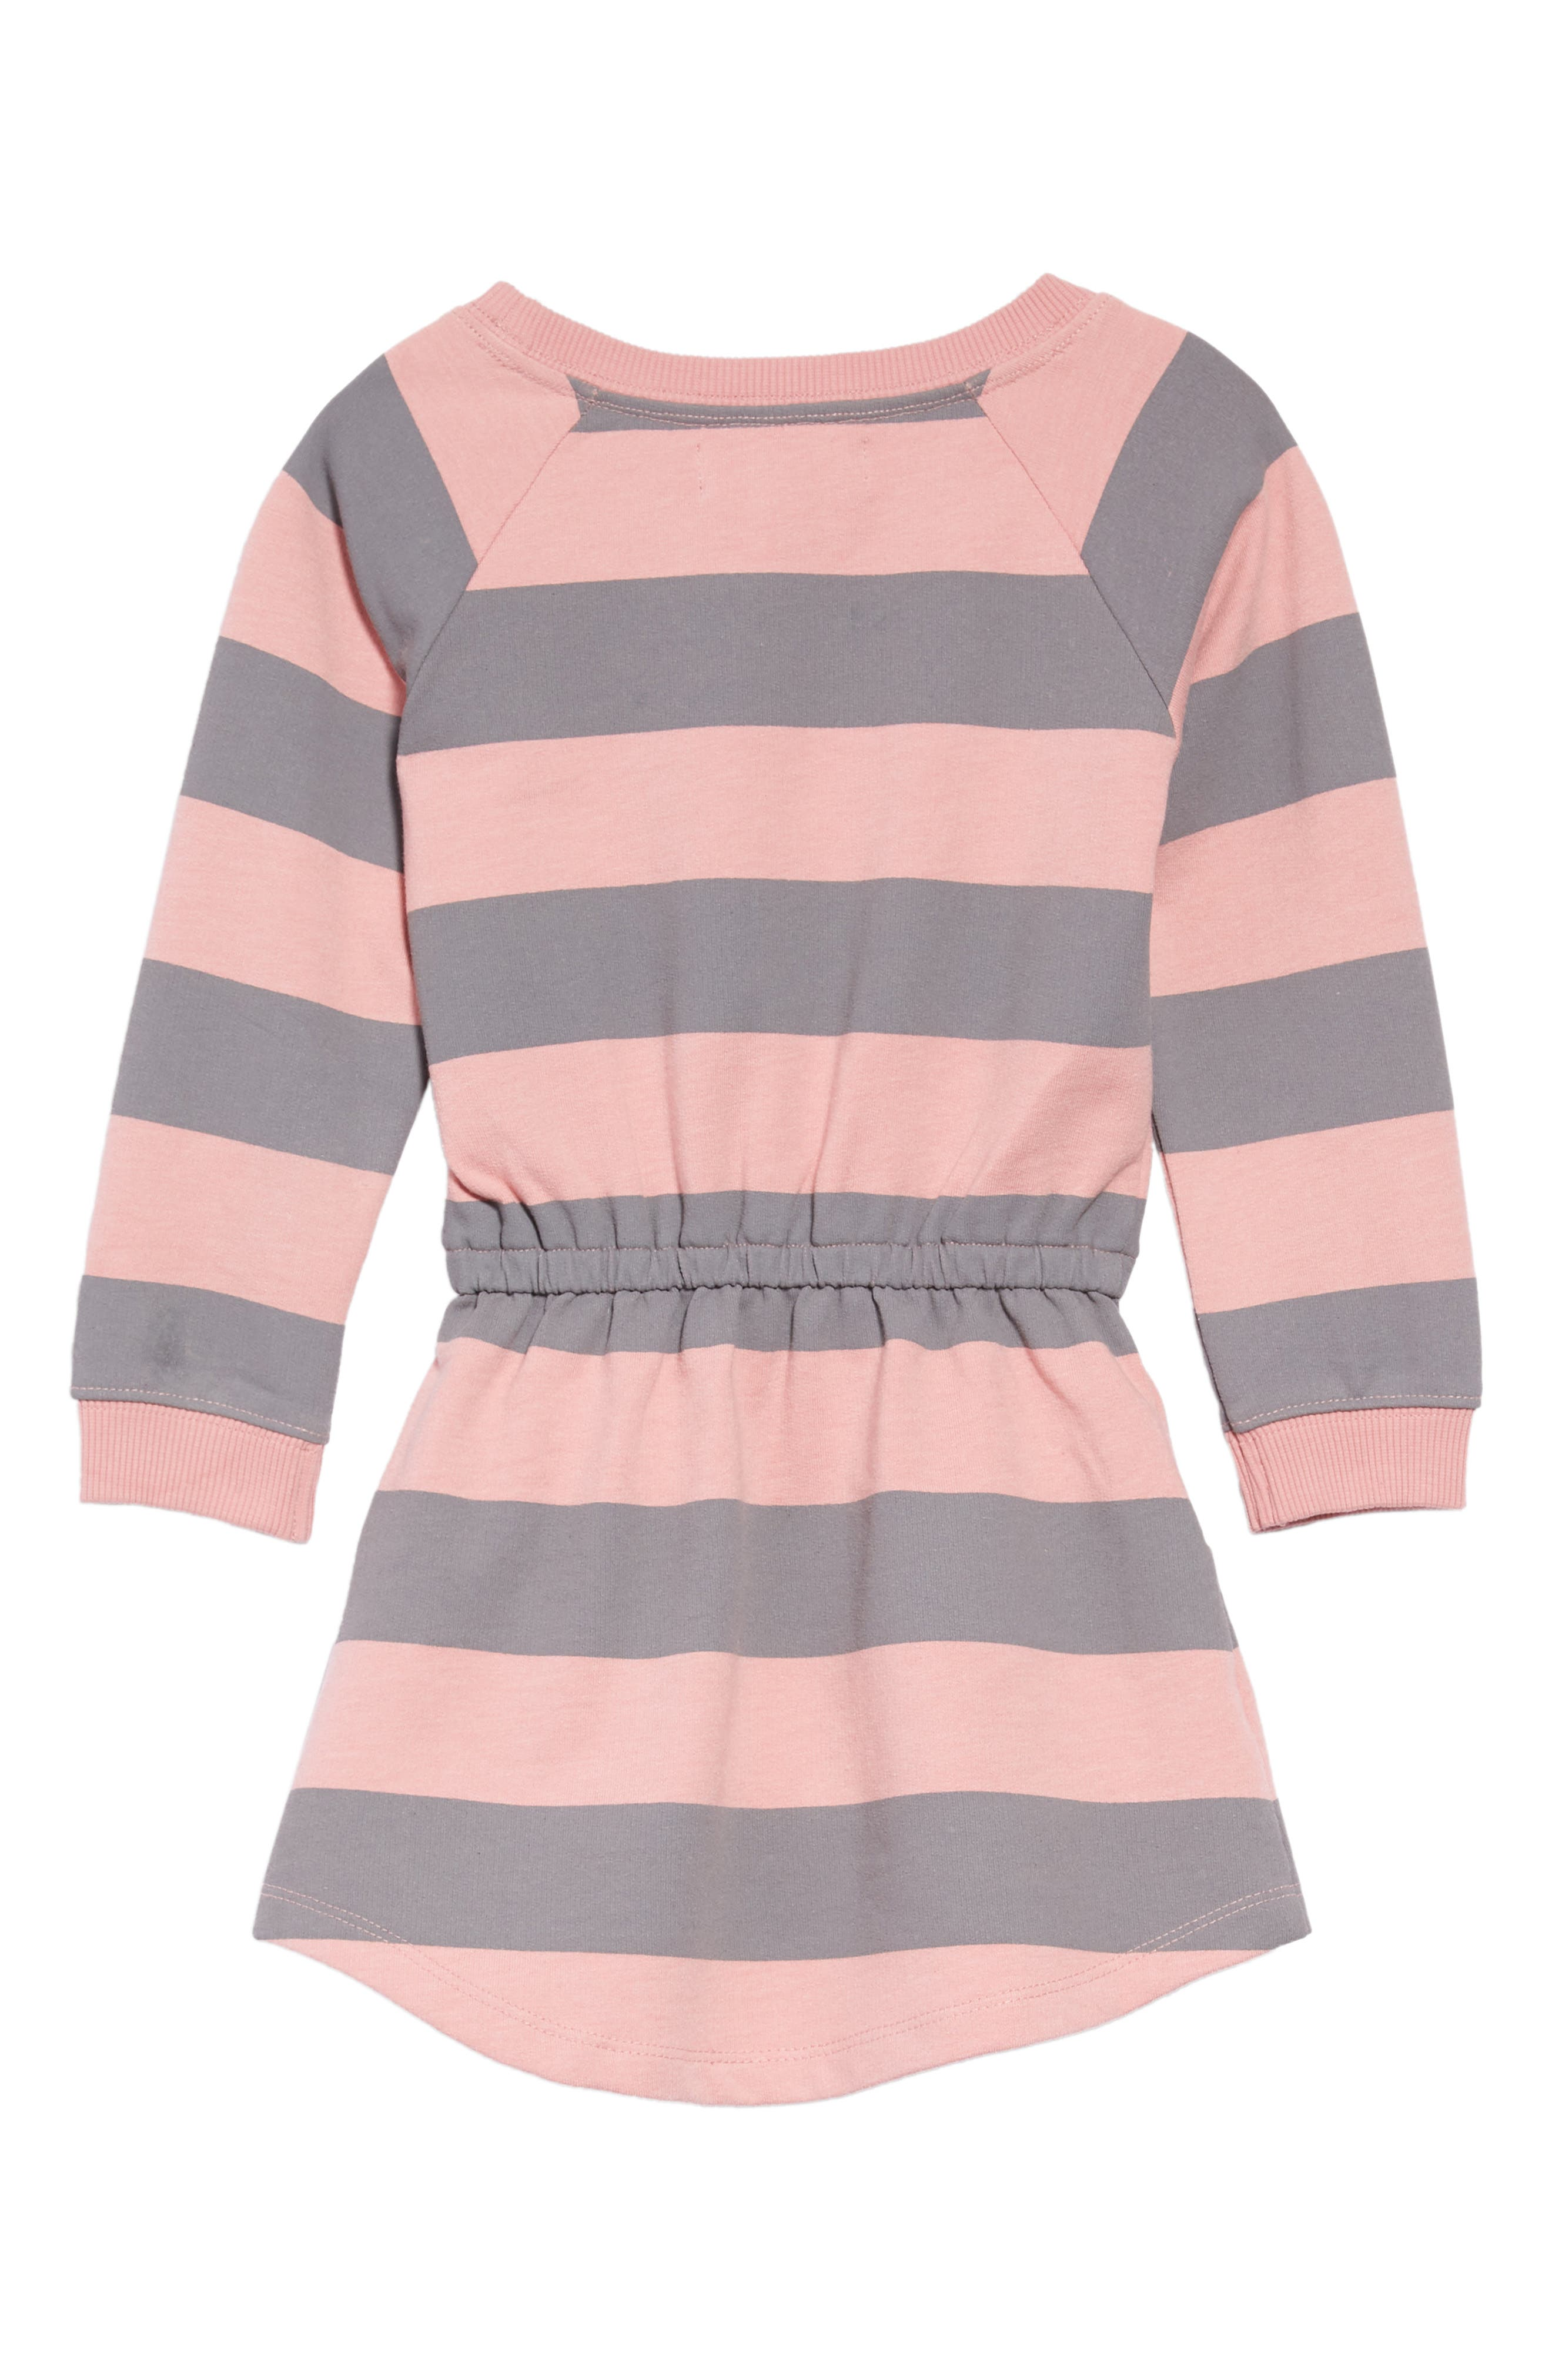 Ruby Sweatshirt Dress,                             Alternate thumbnail 2, color,                             PINK